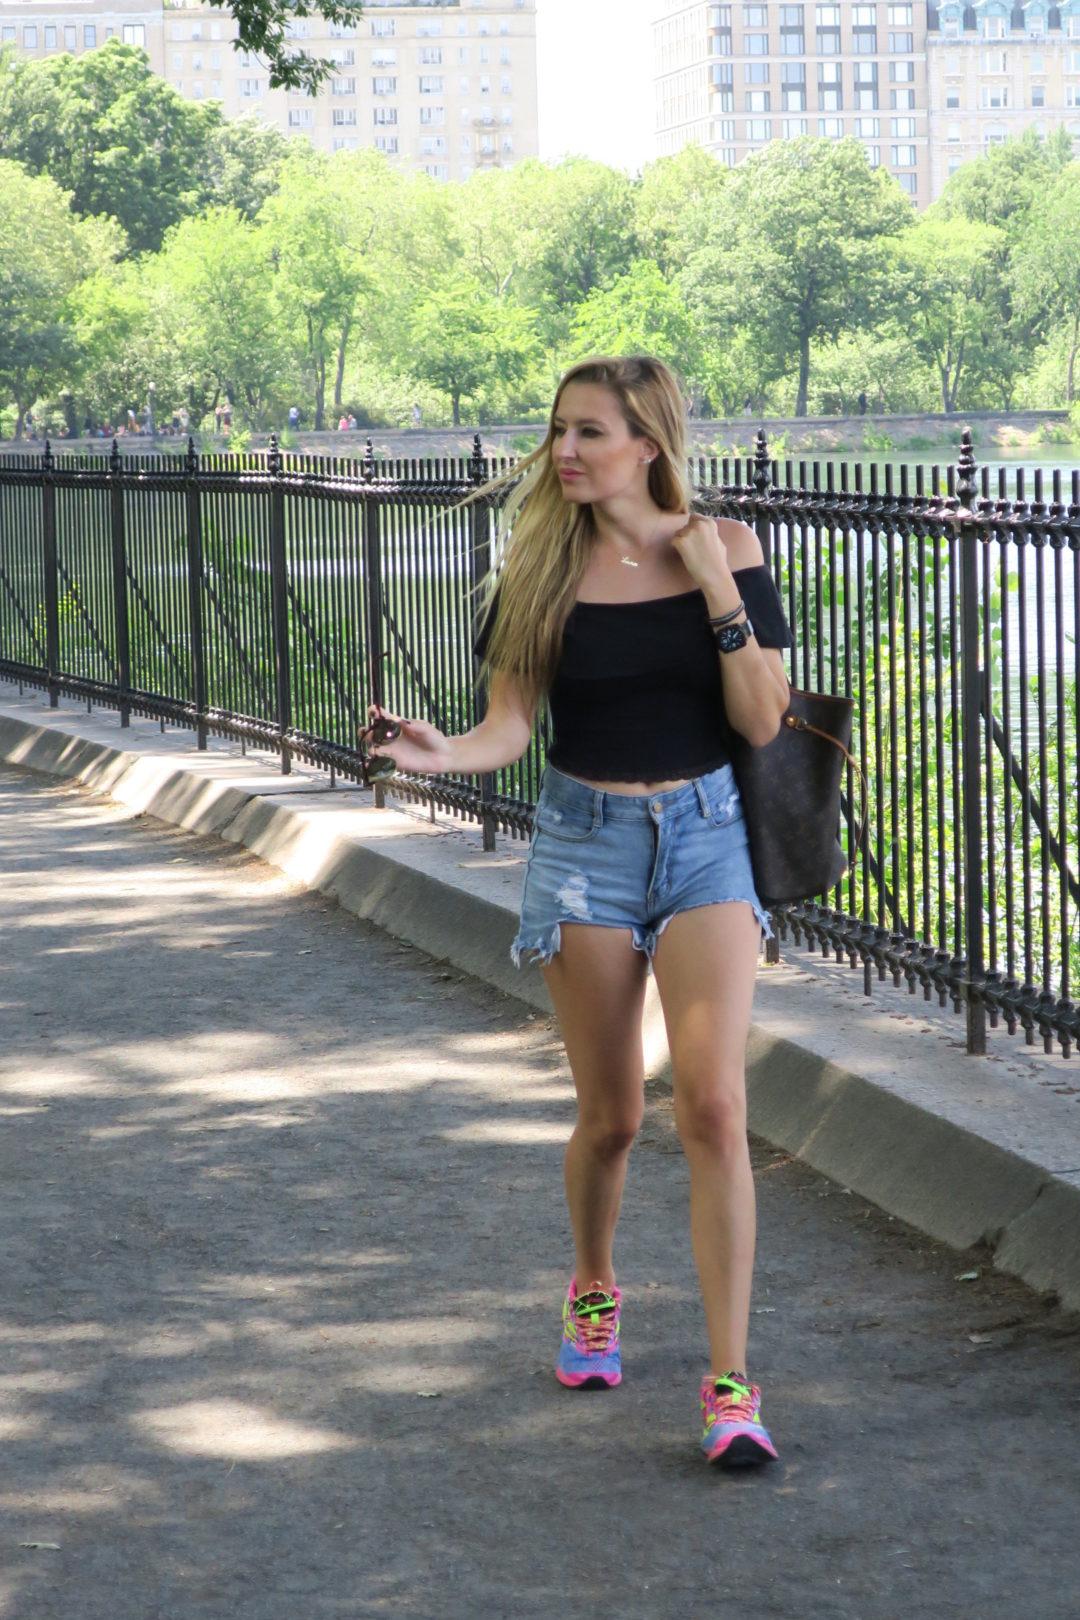 Central_Park_NYC_Bymyheels_Lara_Martin_Gilarranz (2)